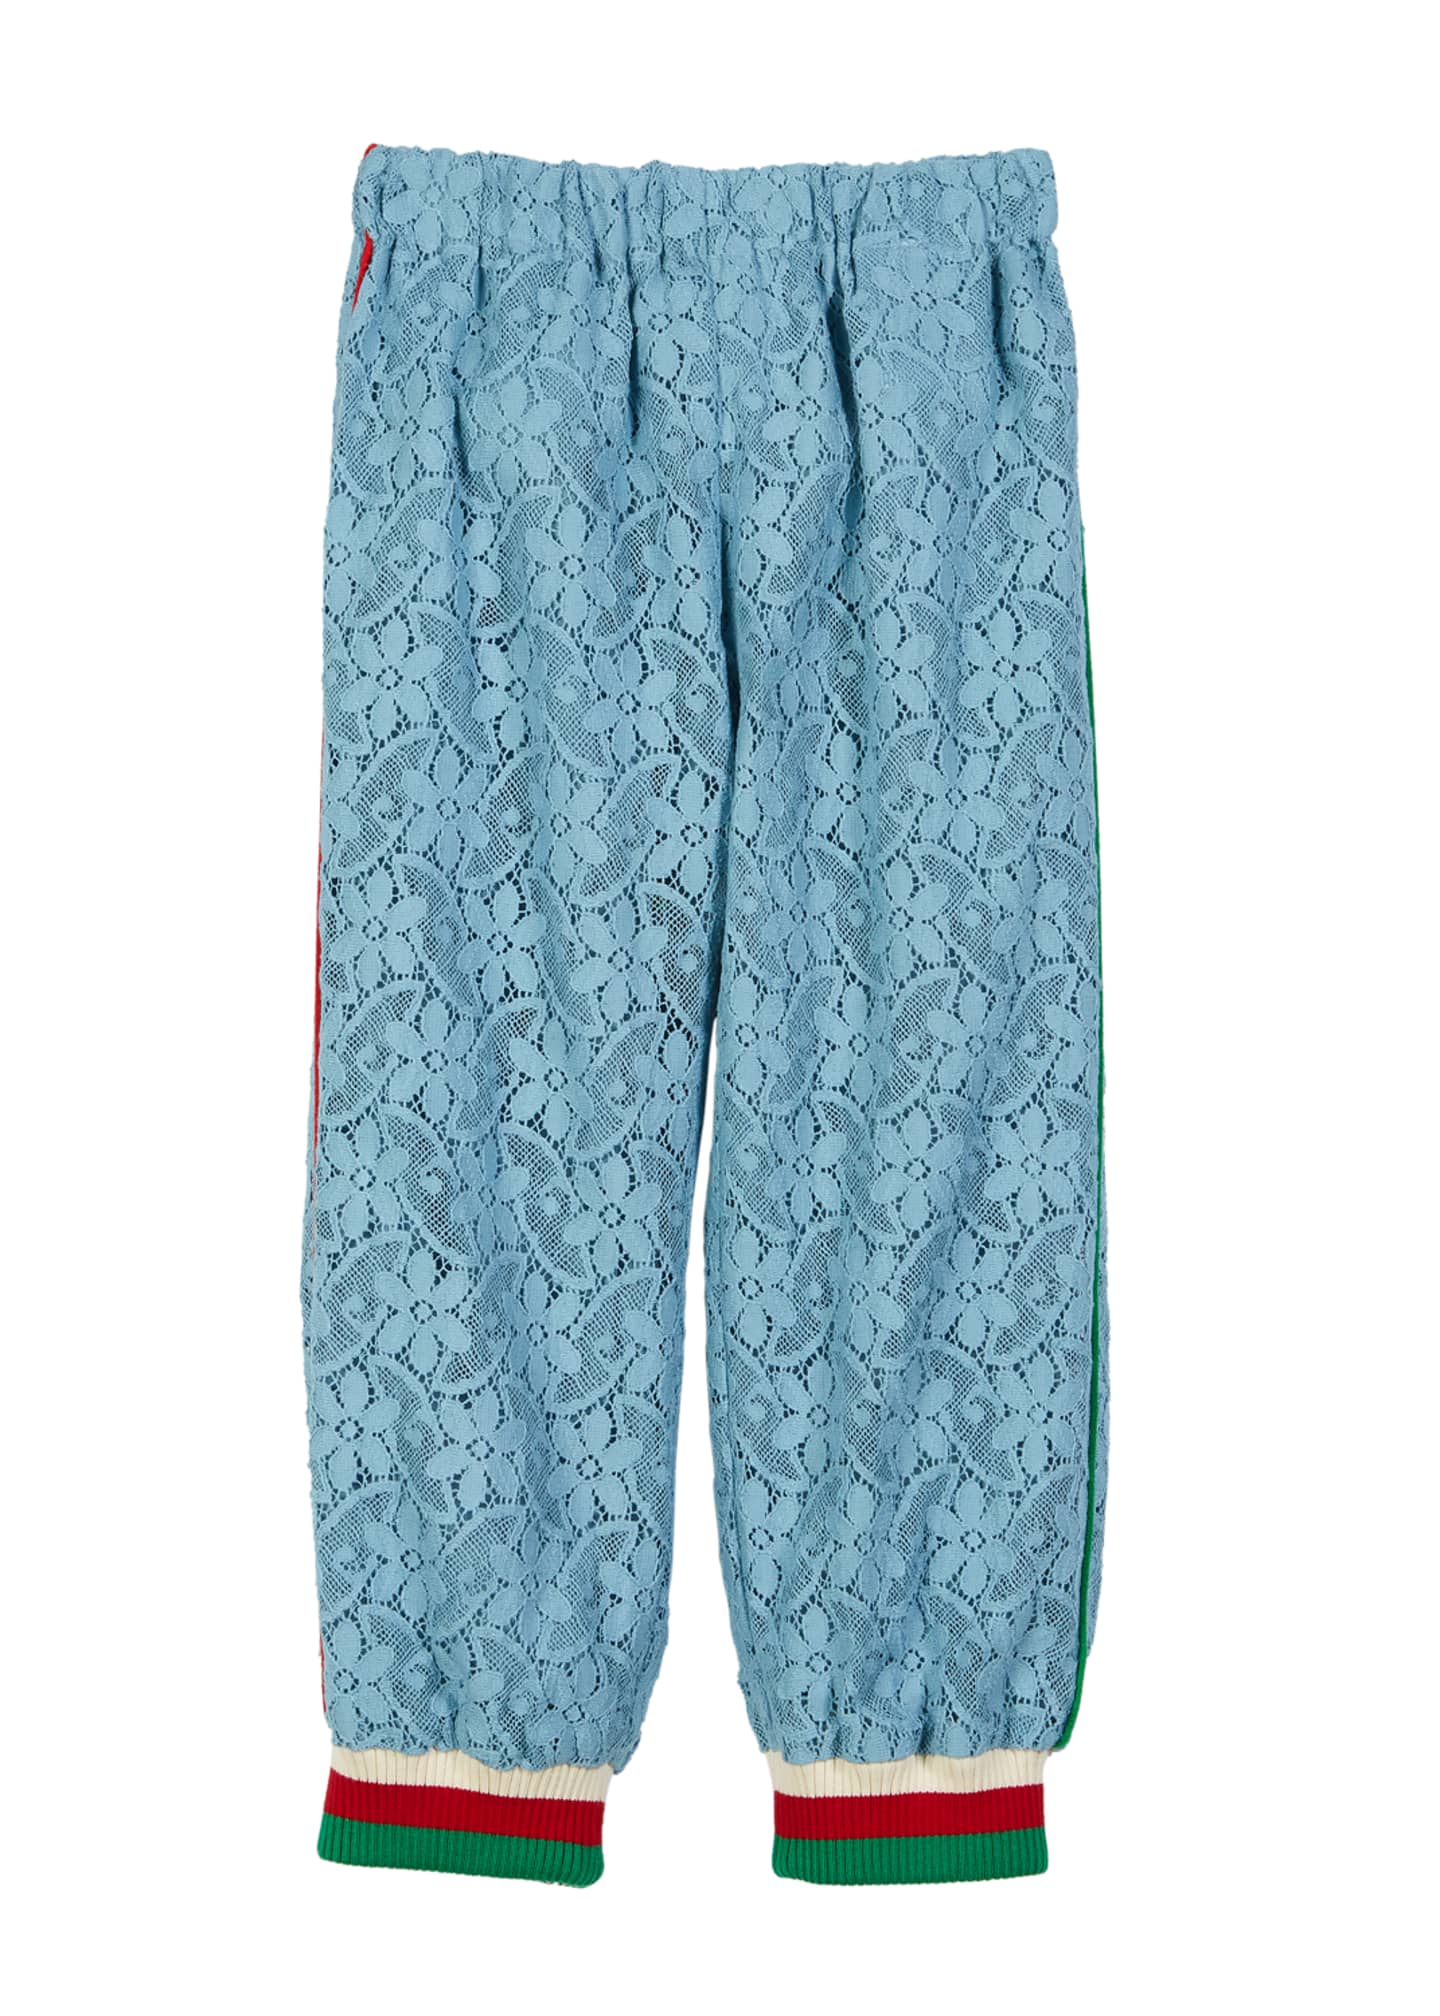 Gucci Lace Sweatpants w/ Striped Knit Ankle Cuffs,